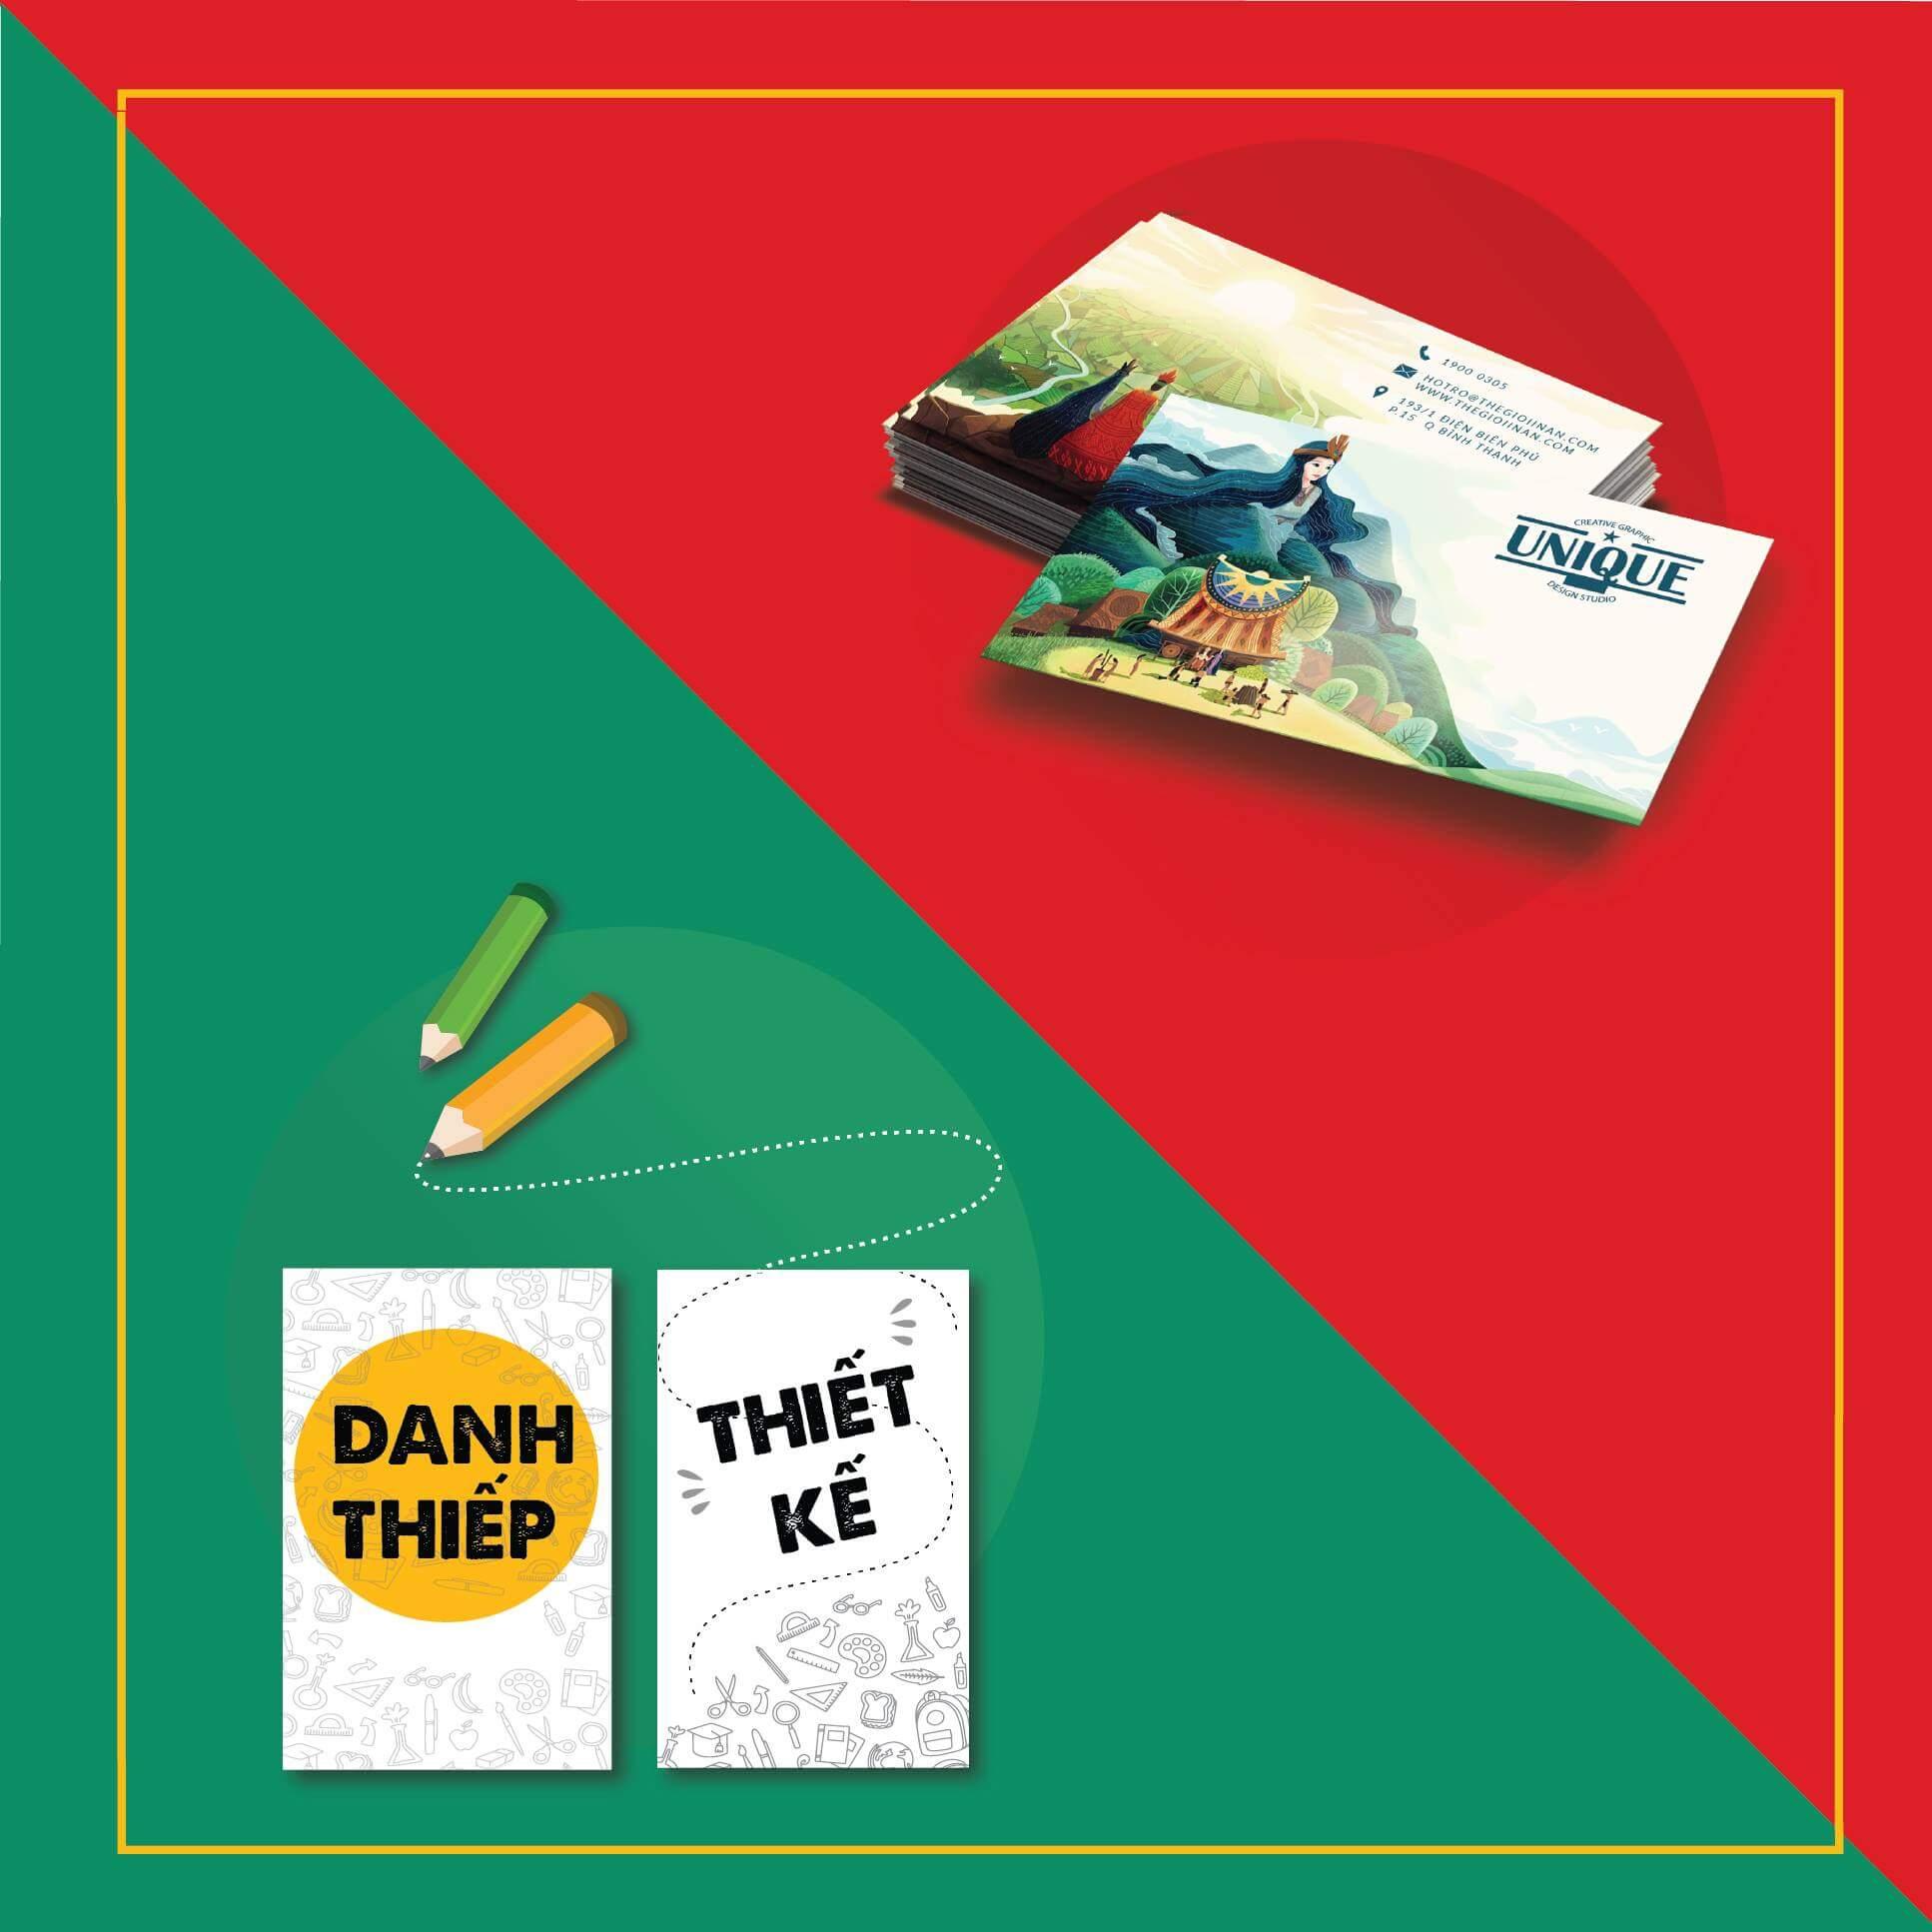 COMBO DANH THIẾP CHUẨN + THIẾT KẾ DANH THIẾP